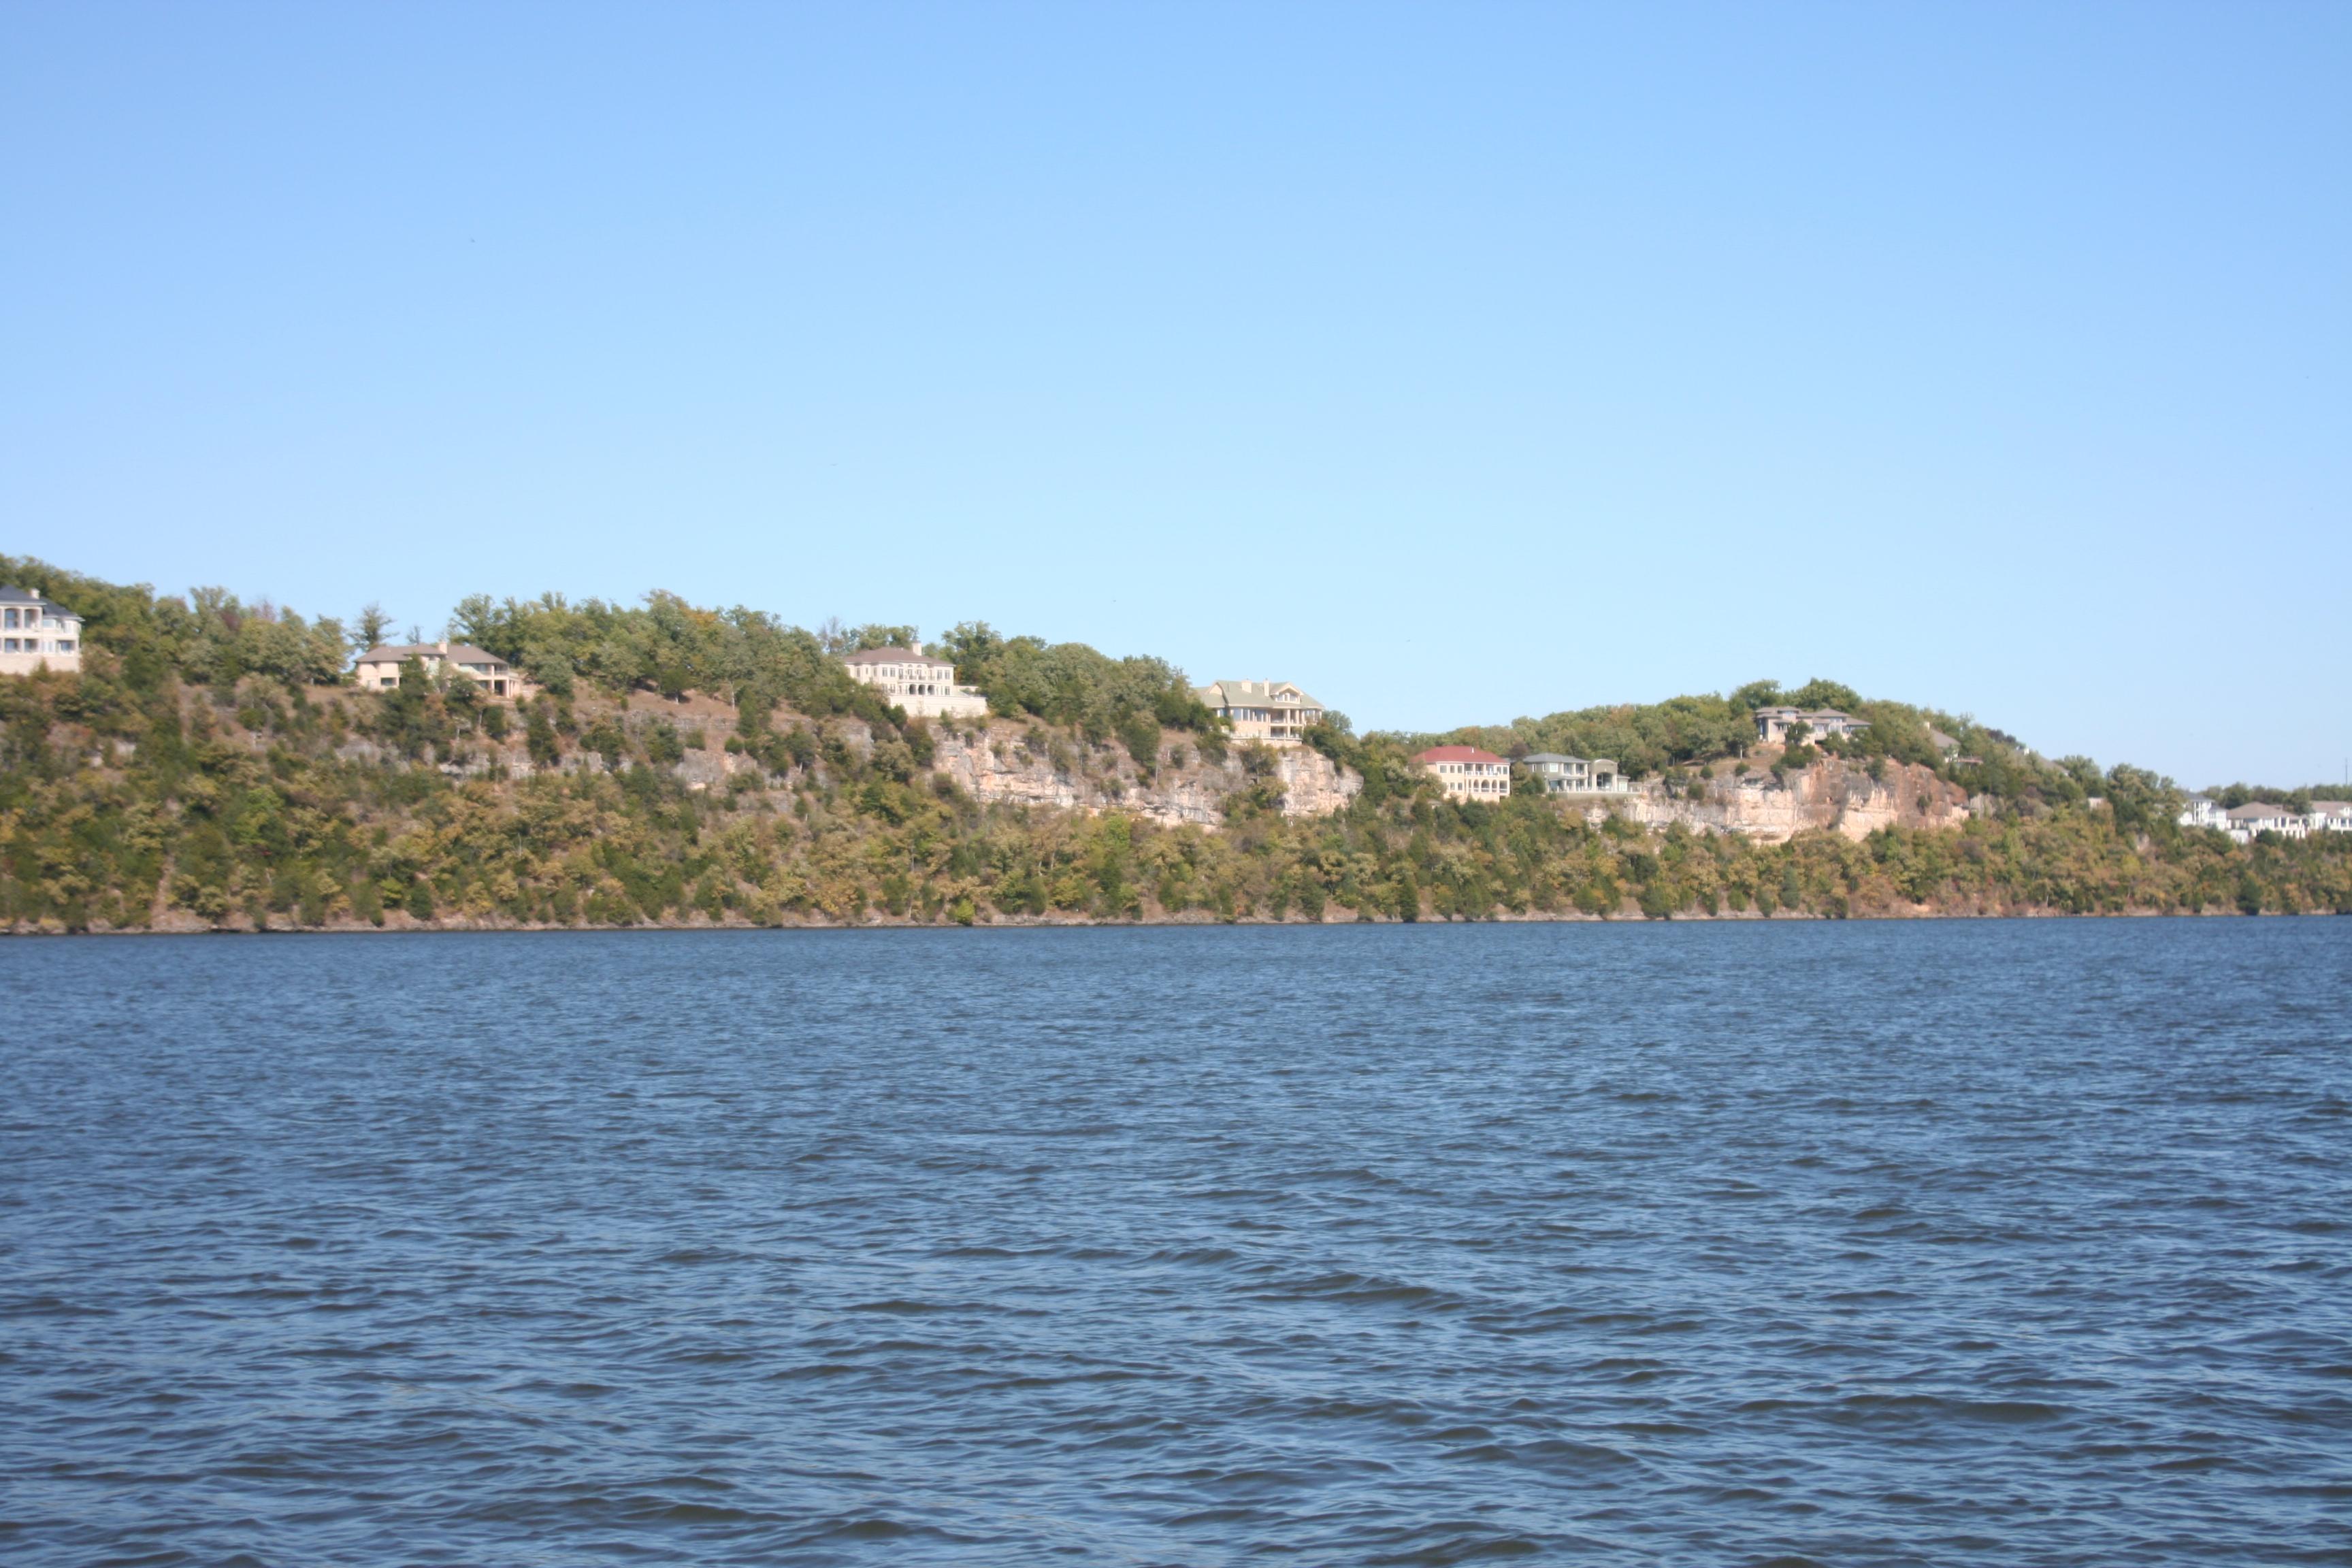 File:Lake of the Ozarks, MO Houses 12.JPG - Wikimedia Commons